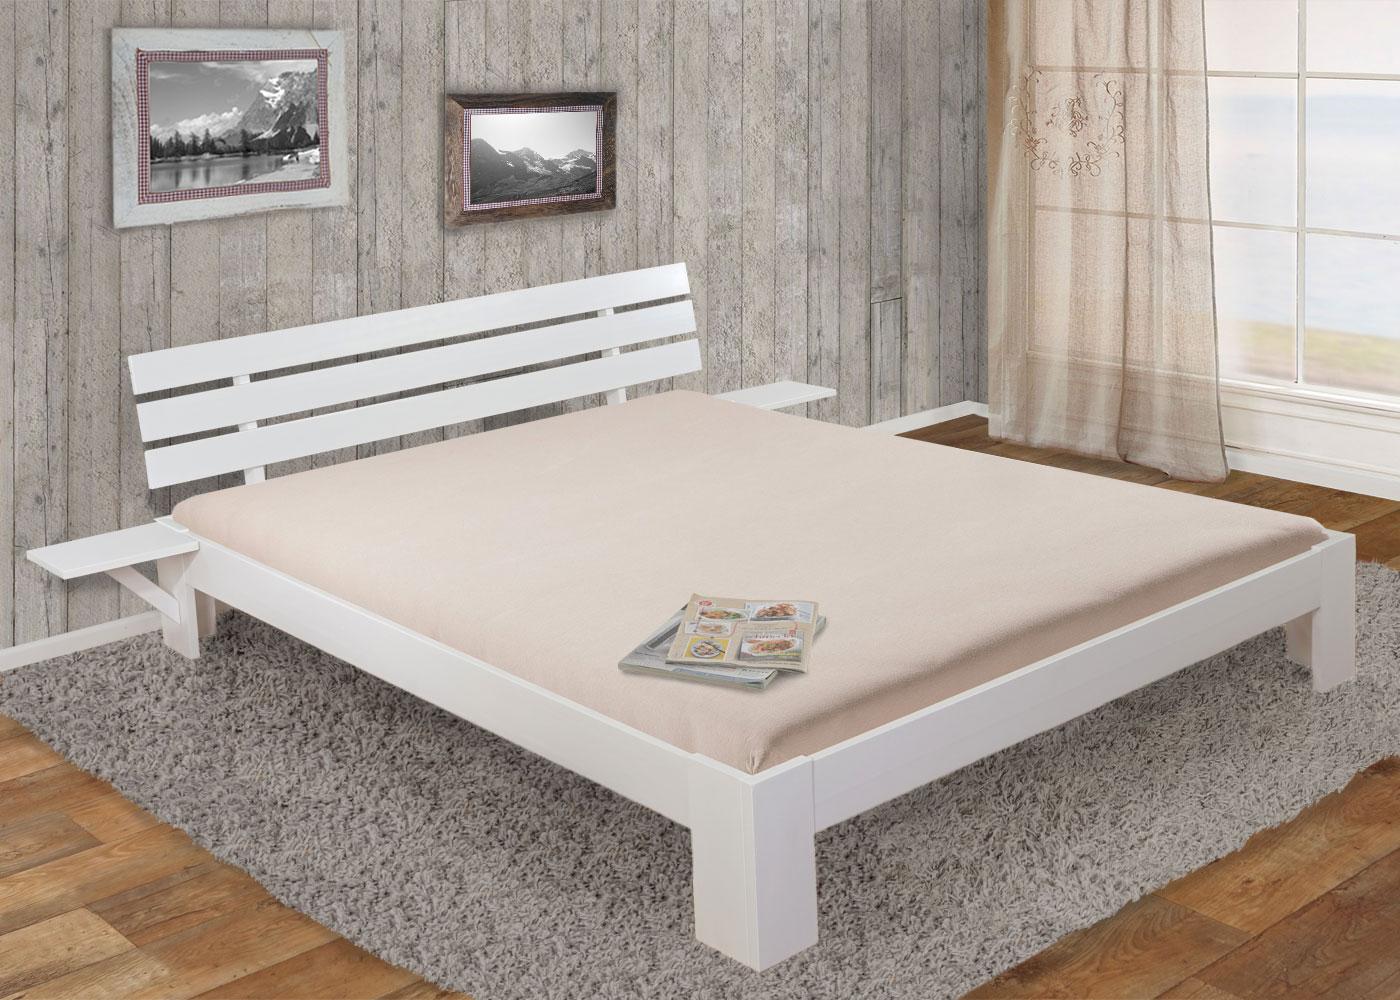 bett bendigo doppelbett incl lattenrost ablage 180x200cm wei lackiert ebay. Black Bedroom Furniture Sets. Home Design Ideas